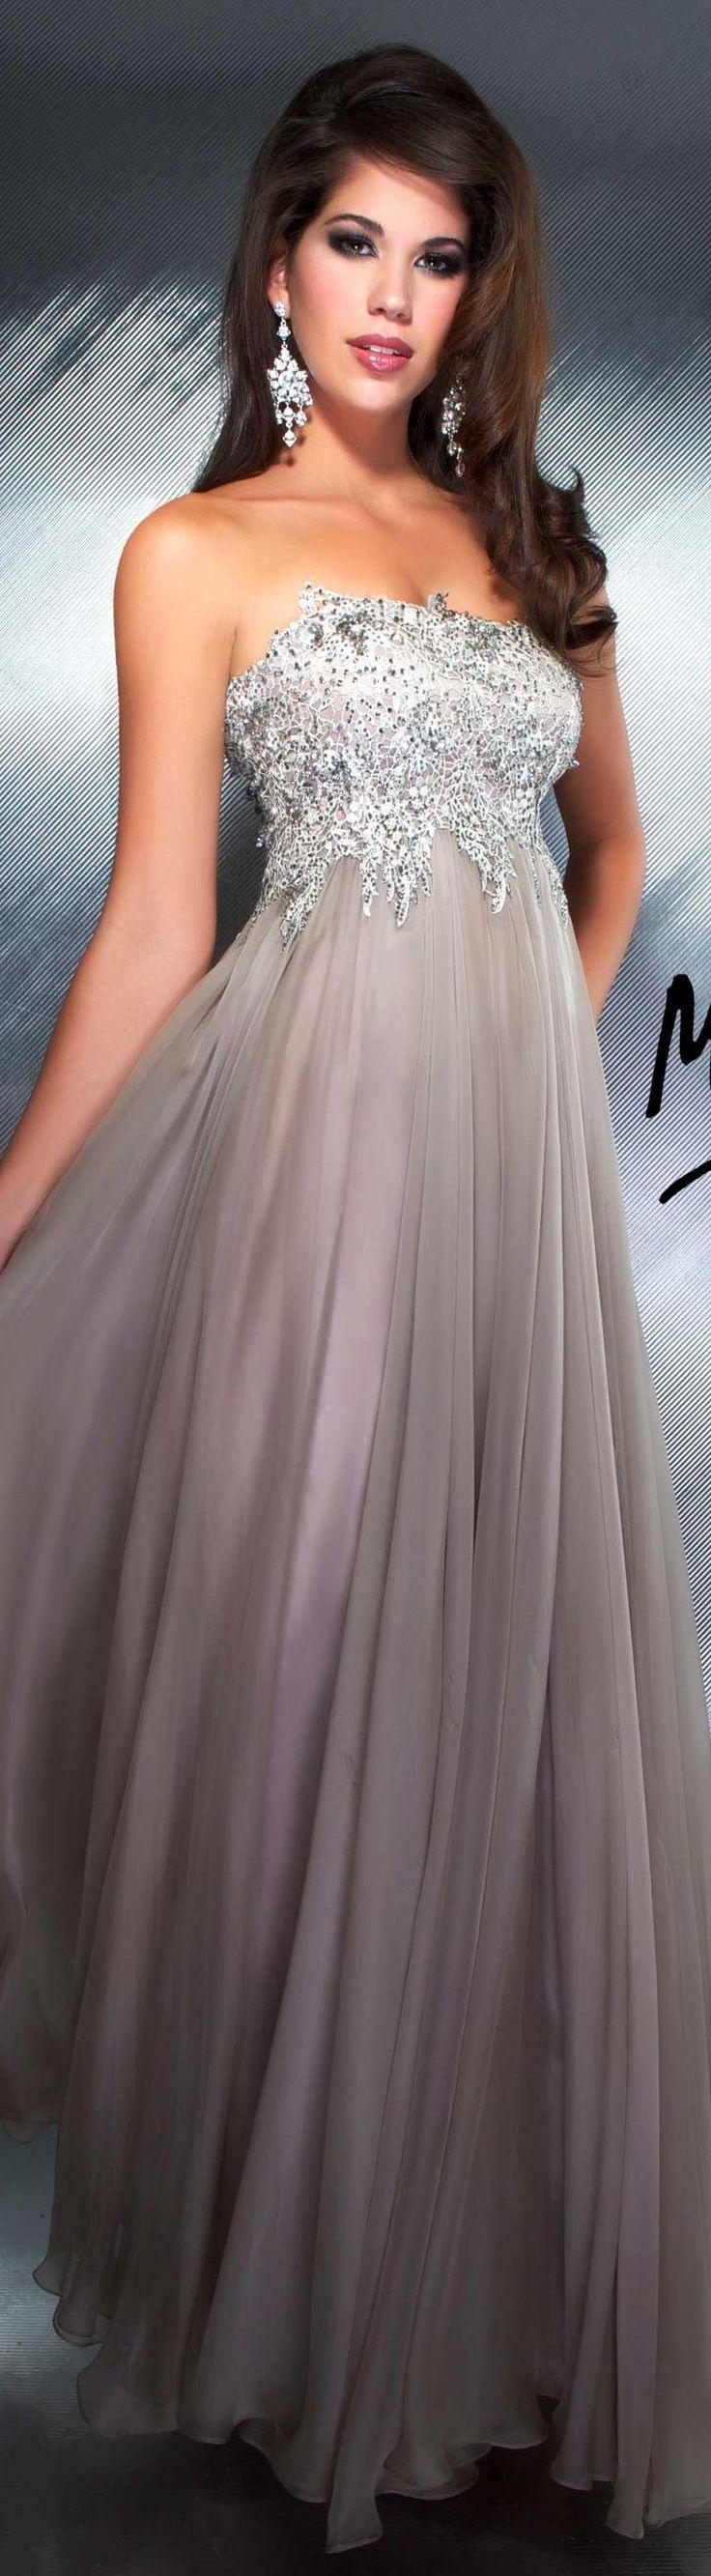 Mac duggal strapless gown dresses pinterest strapless